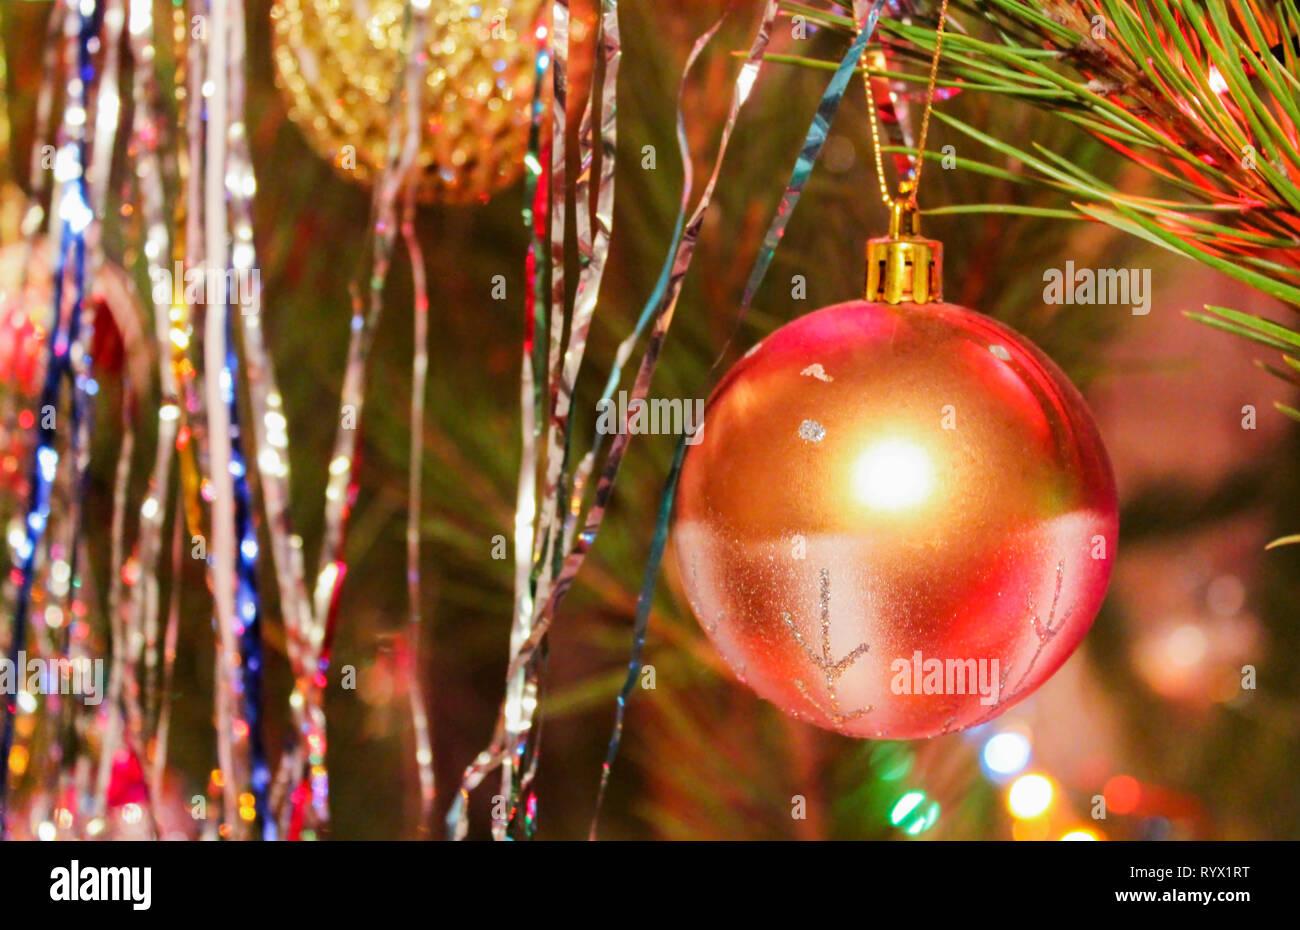 Christmas Ball Garlands.Shiny Christmas Ball On Decorated Rain And Garlands